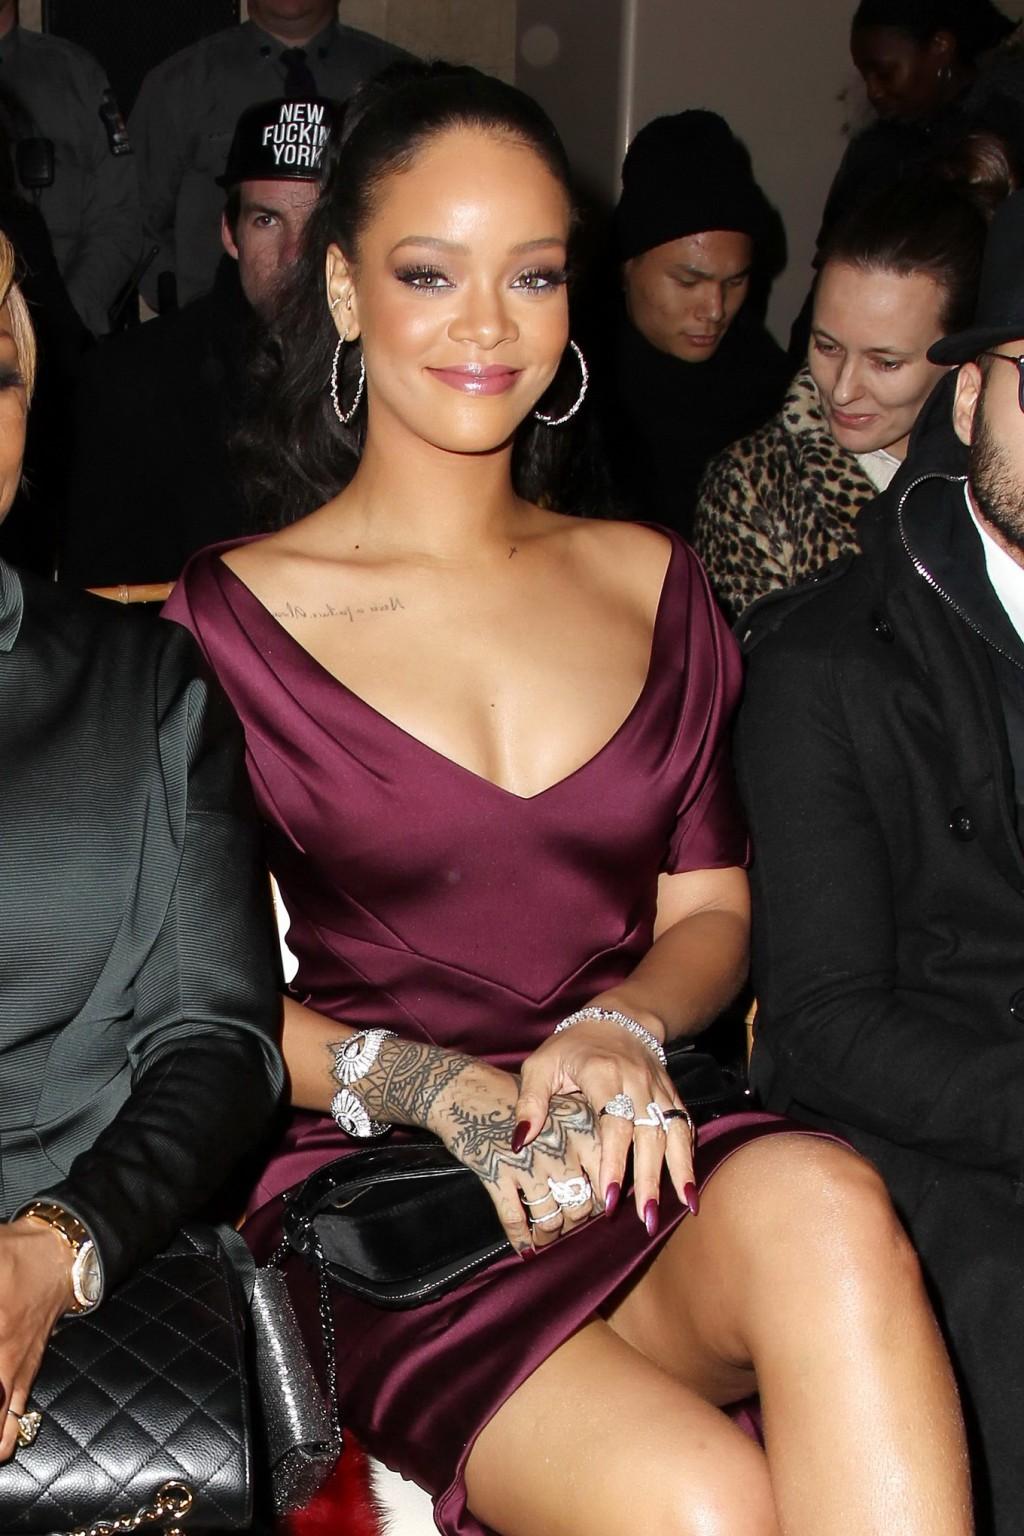 Upskirt rihanna Rihanna flashes